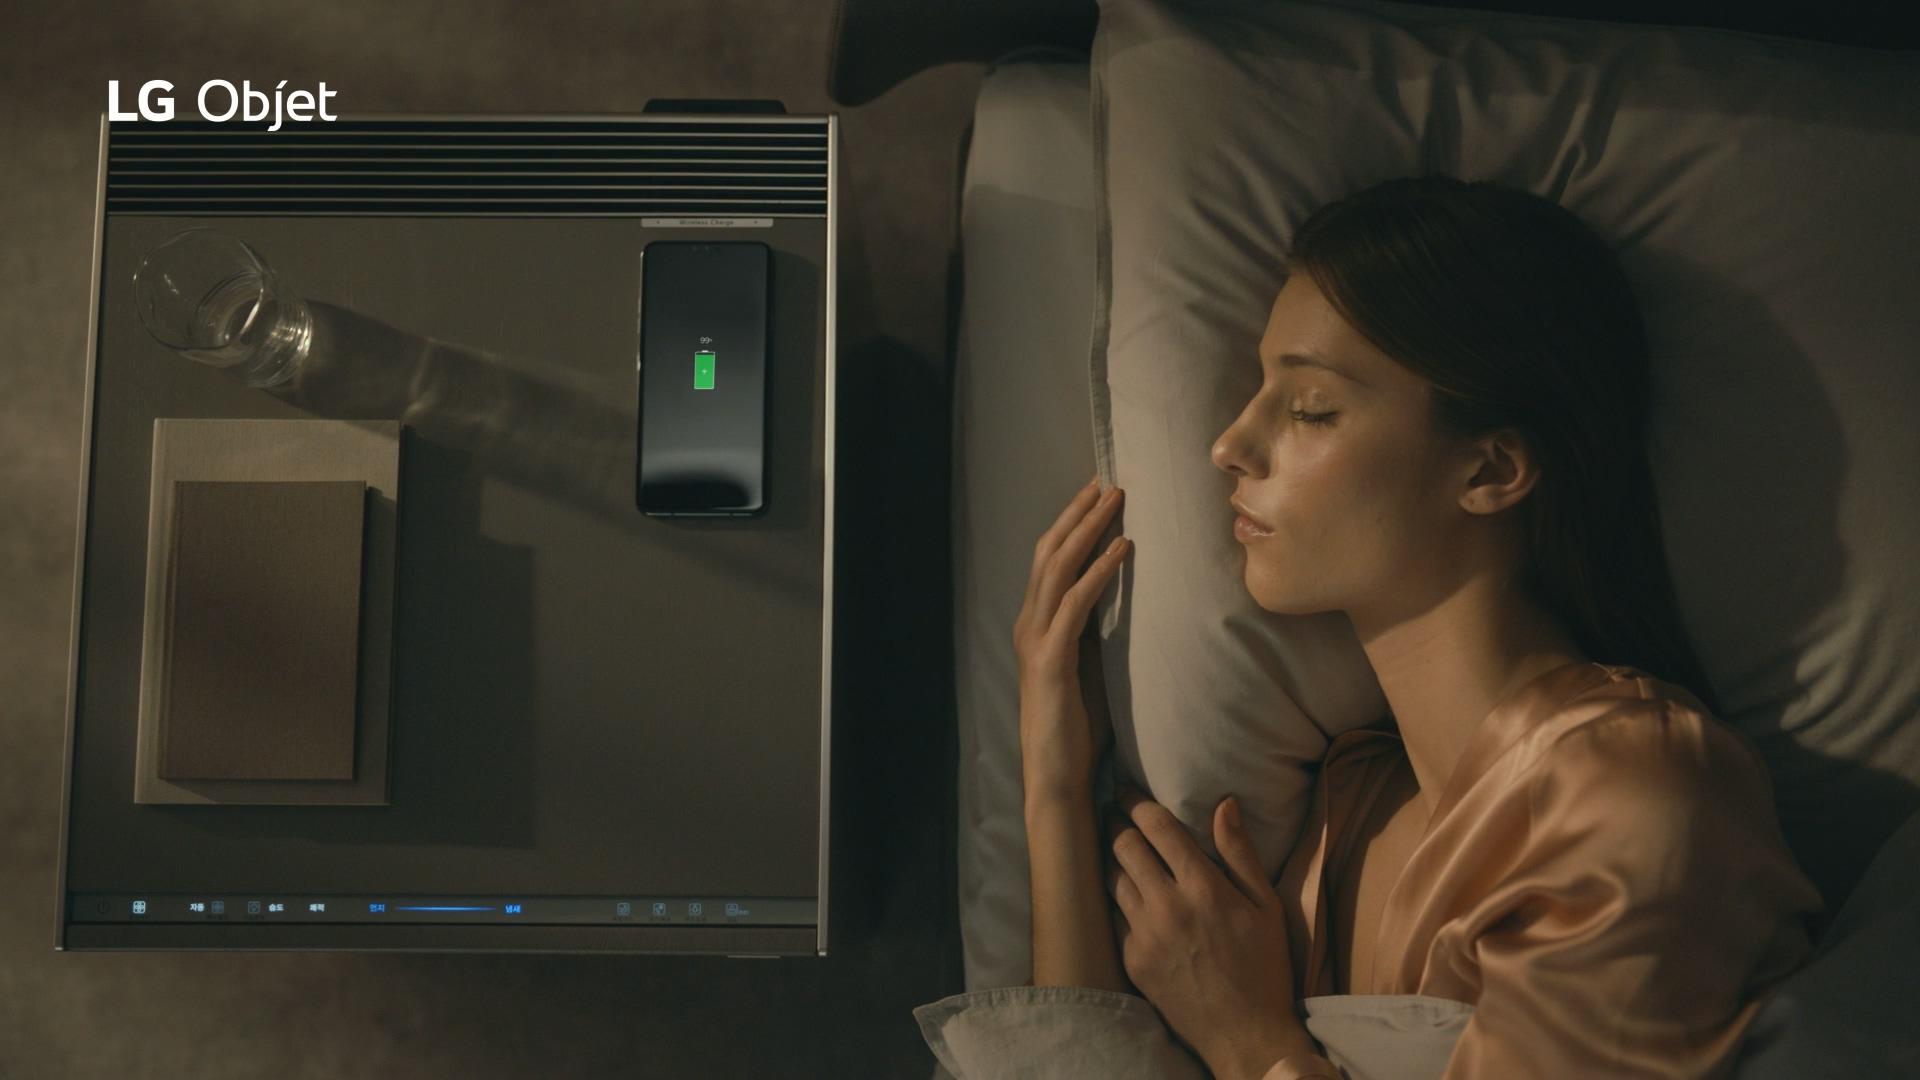 LG 오브제 제품을 상세하게 소개하는 온라인 광고